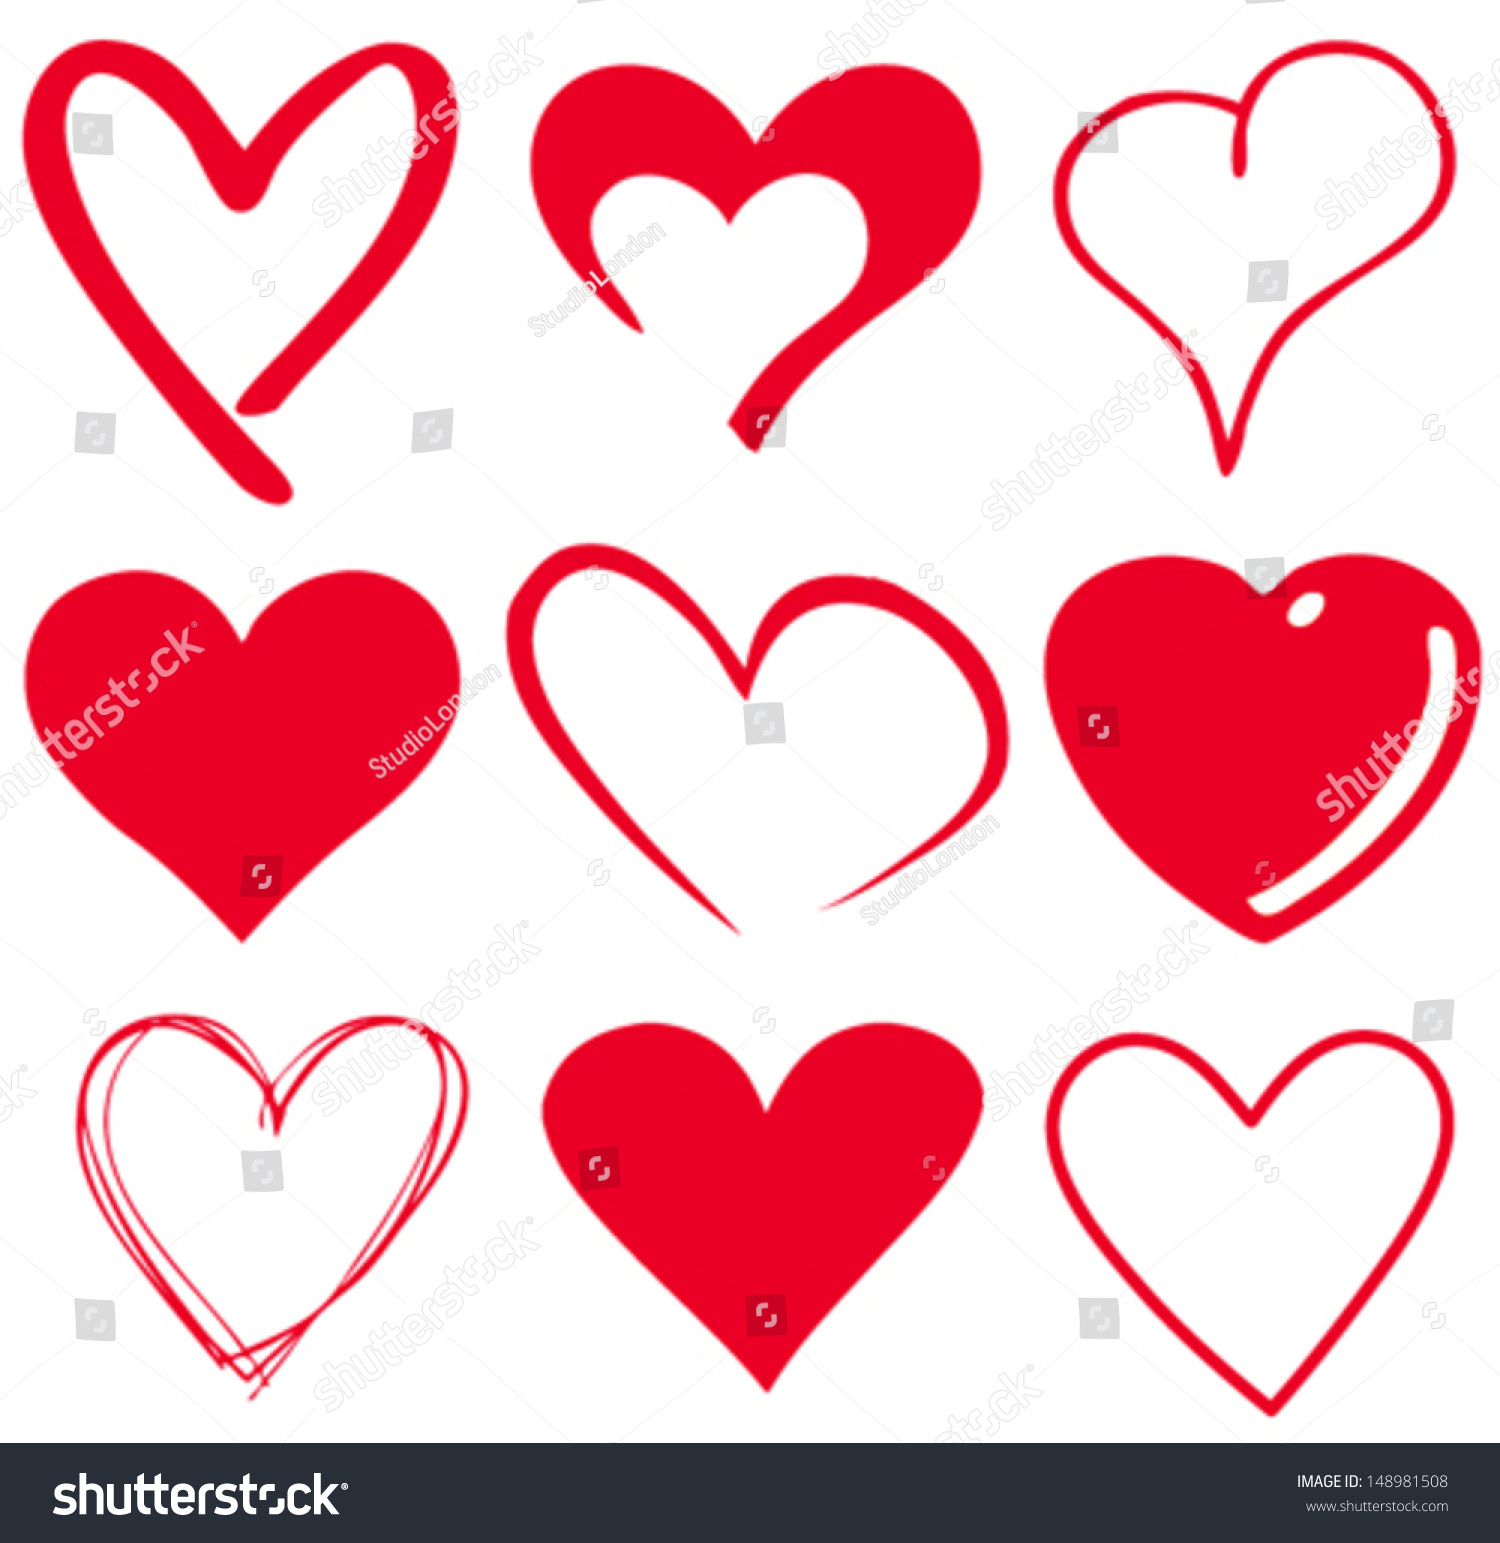 Vector heart silhouette